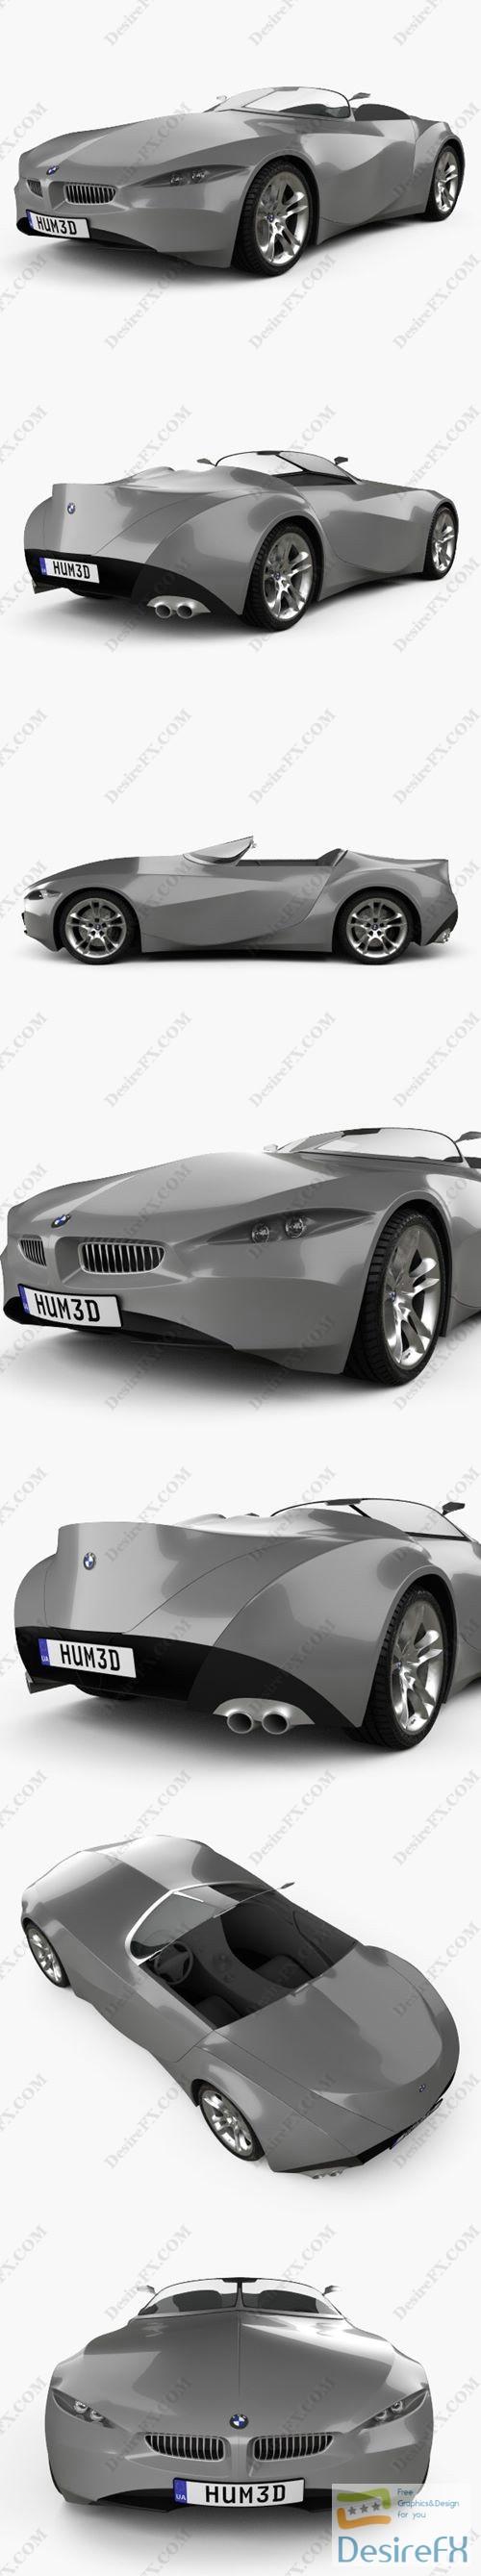 BMW GINA Light Visionary Model 2008 3D Model